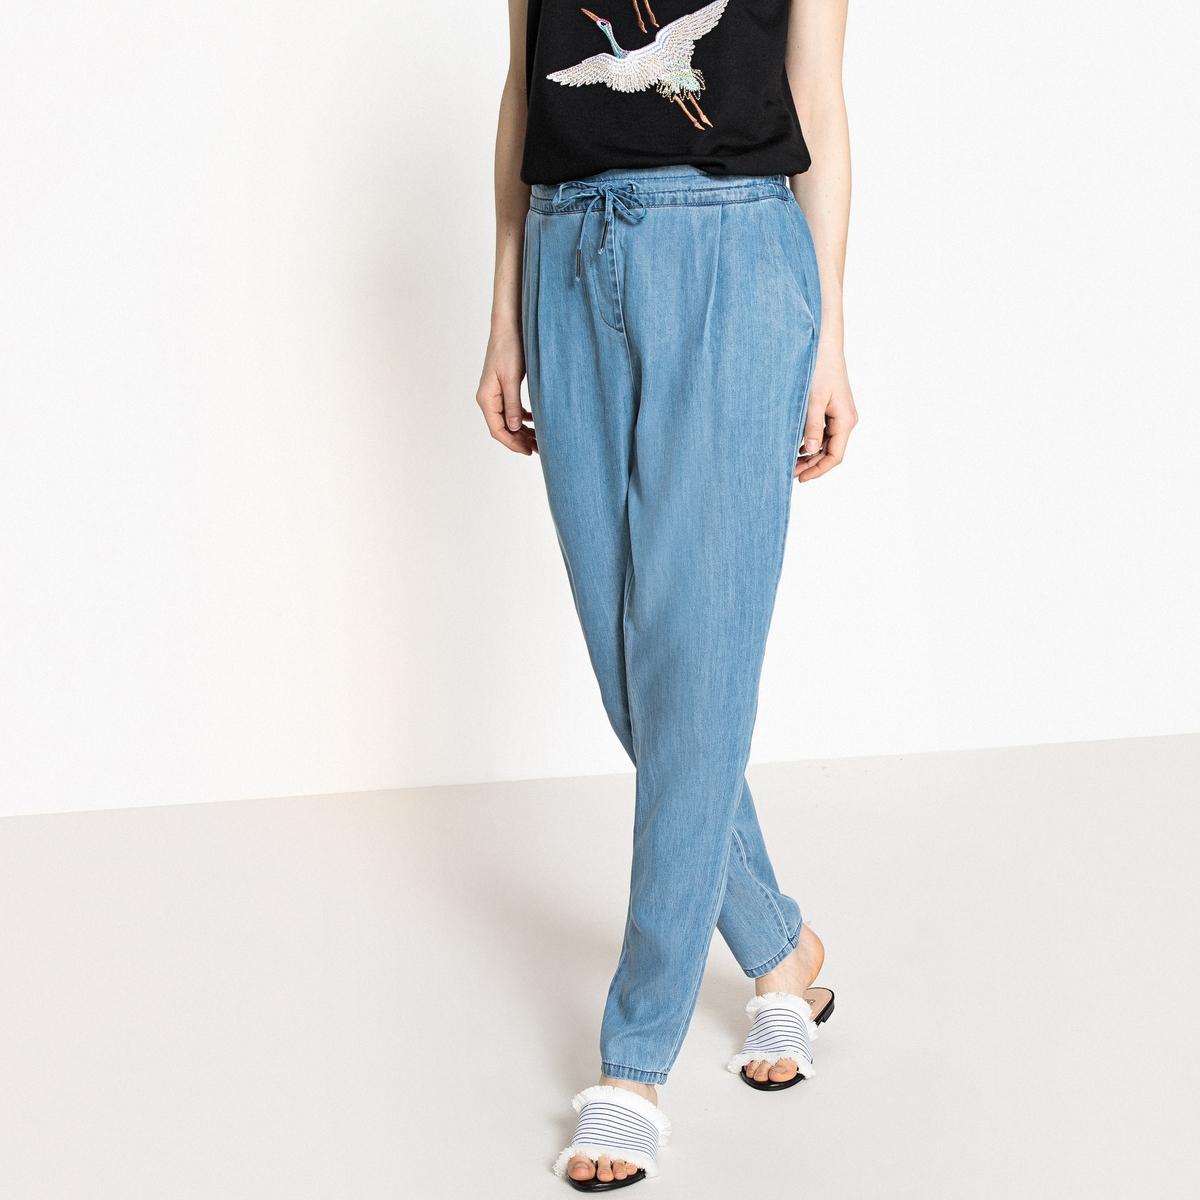 Брюки свободные, широкие три четверти брюки moda di chiara брюки широкие